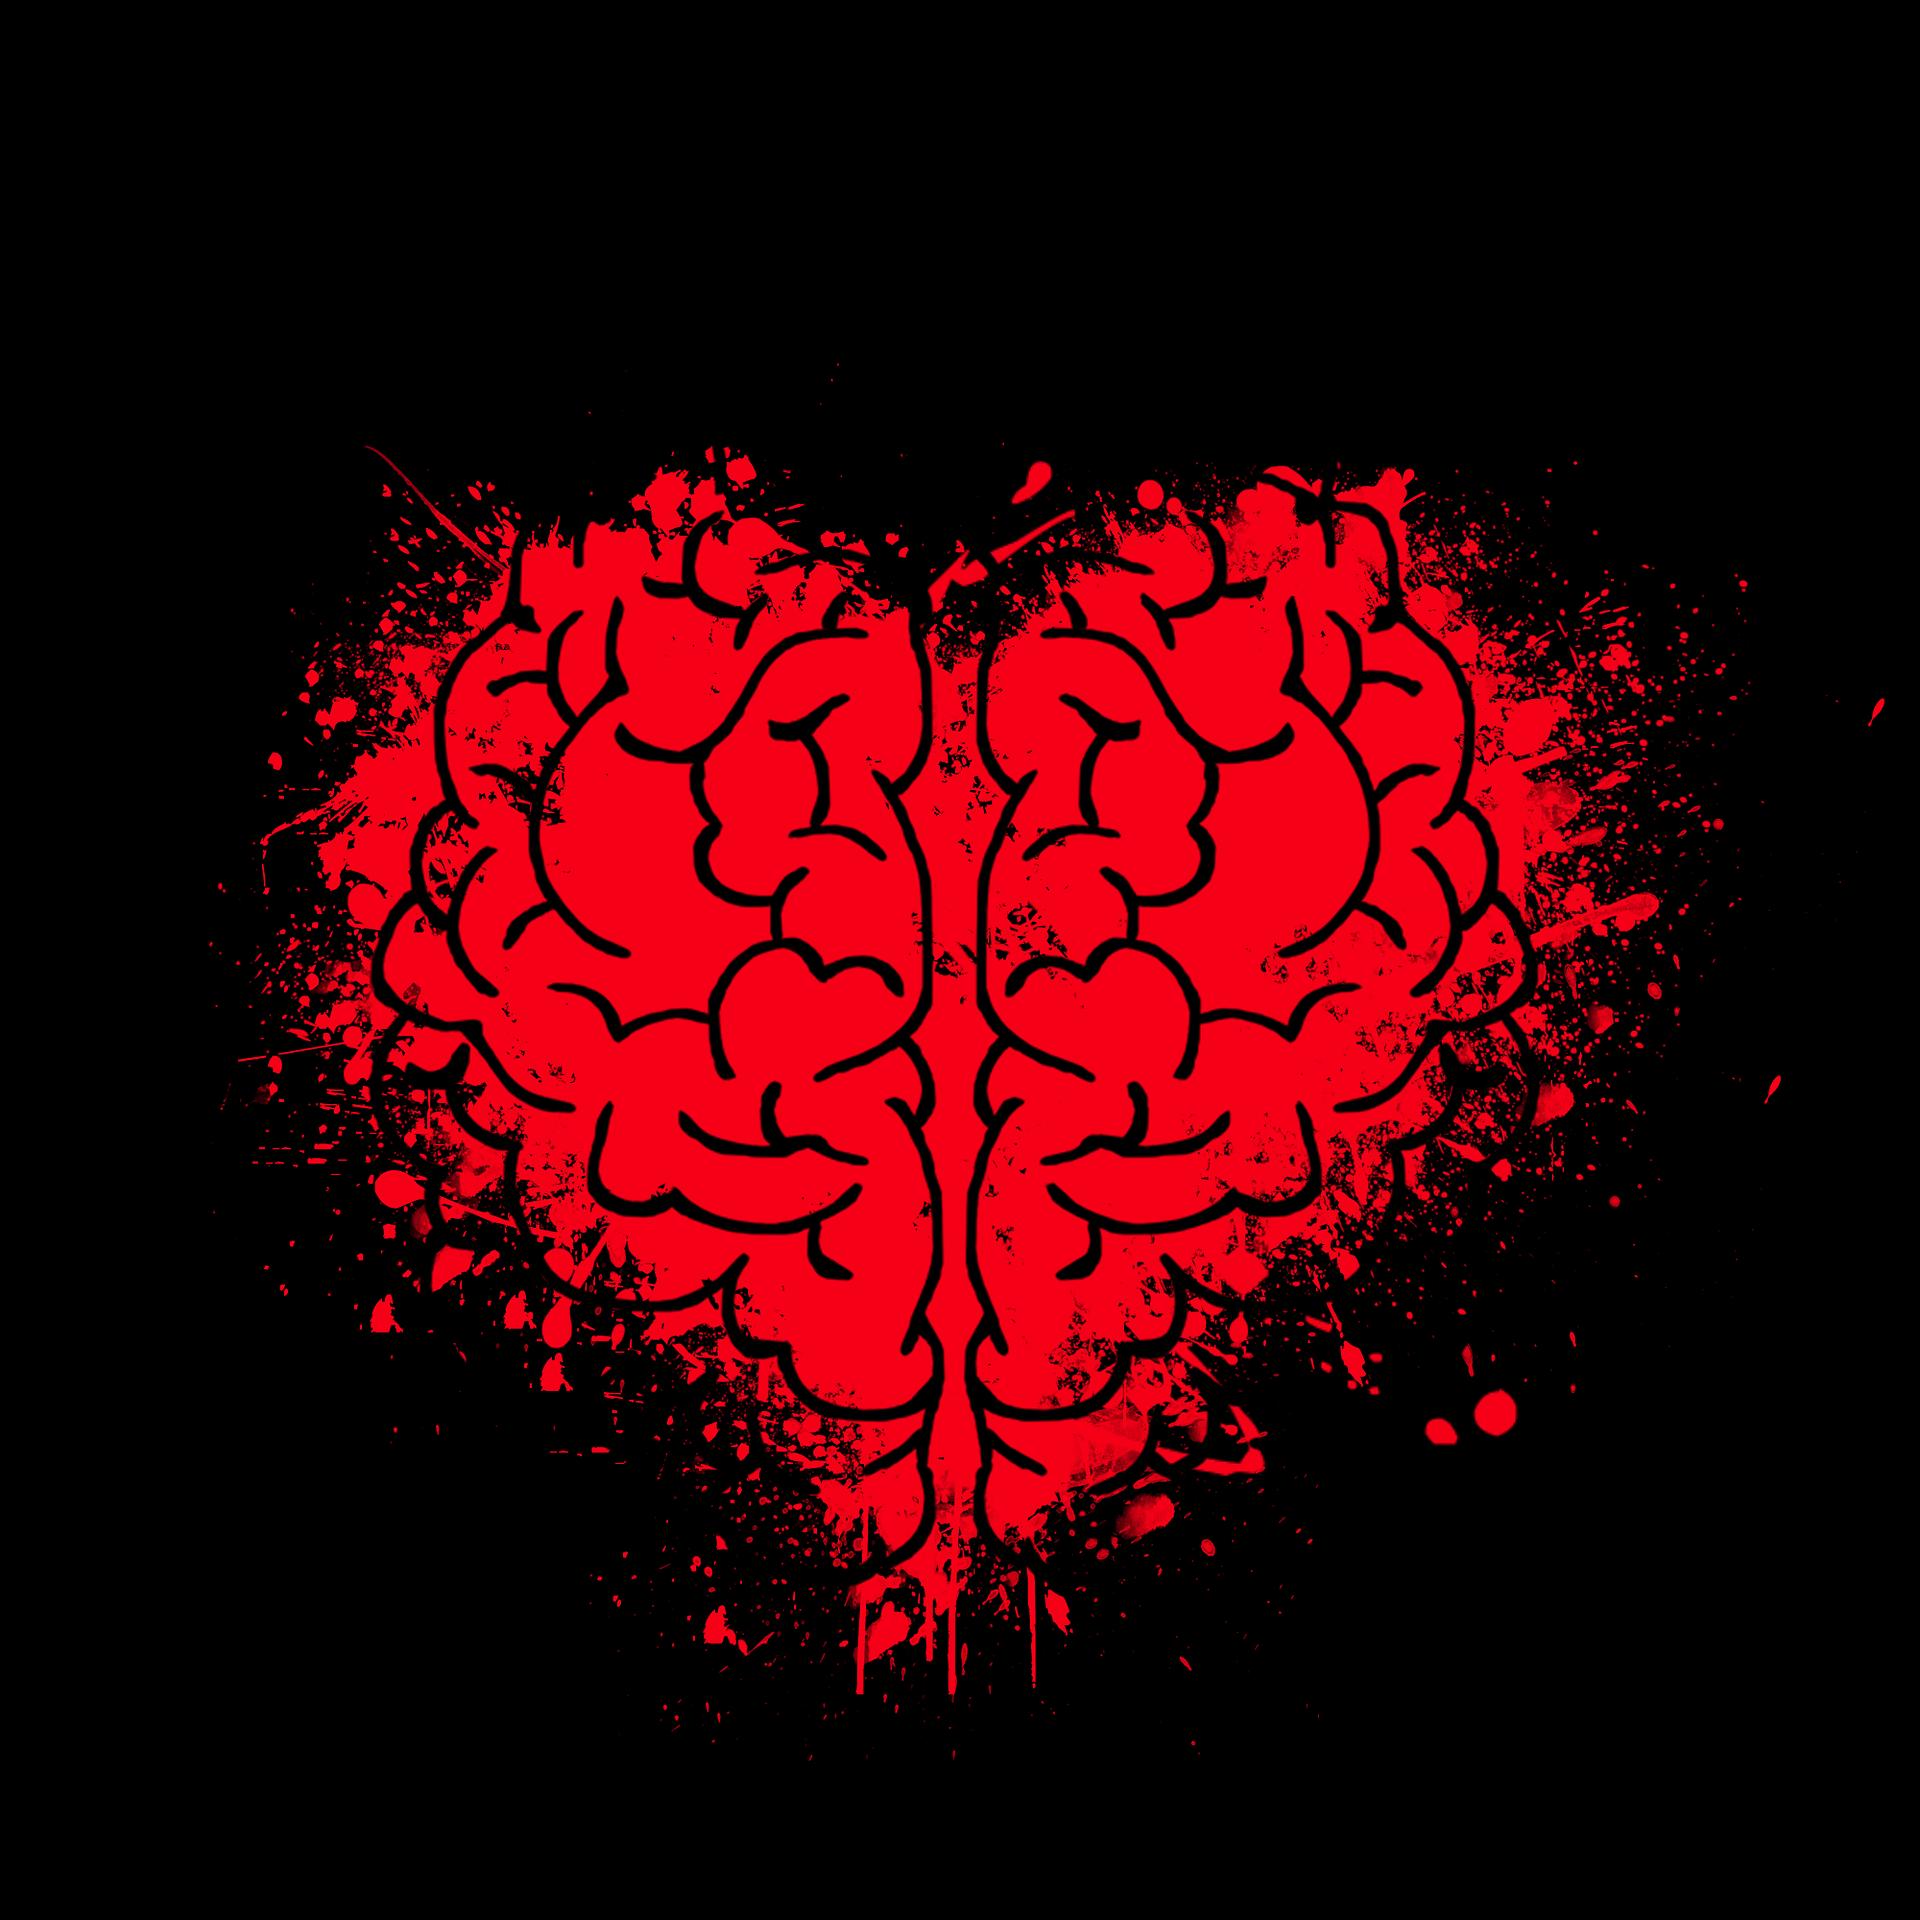 heart-2356621_1920